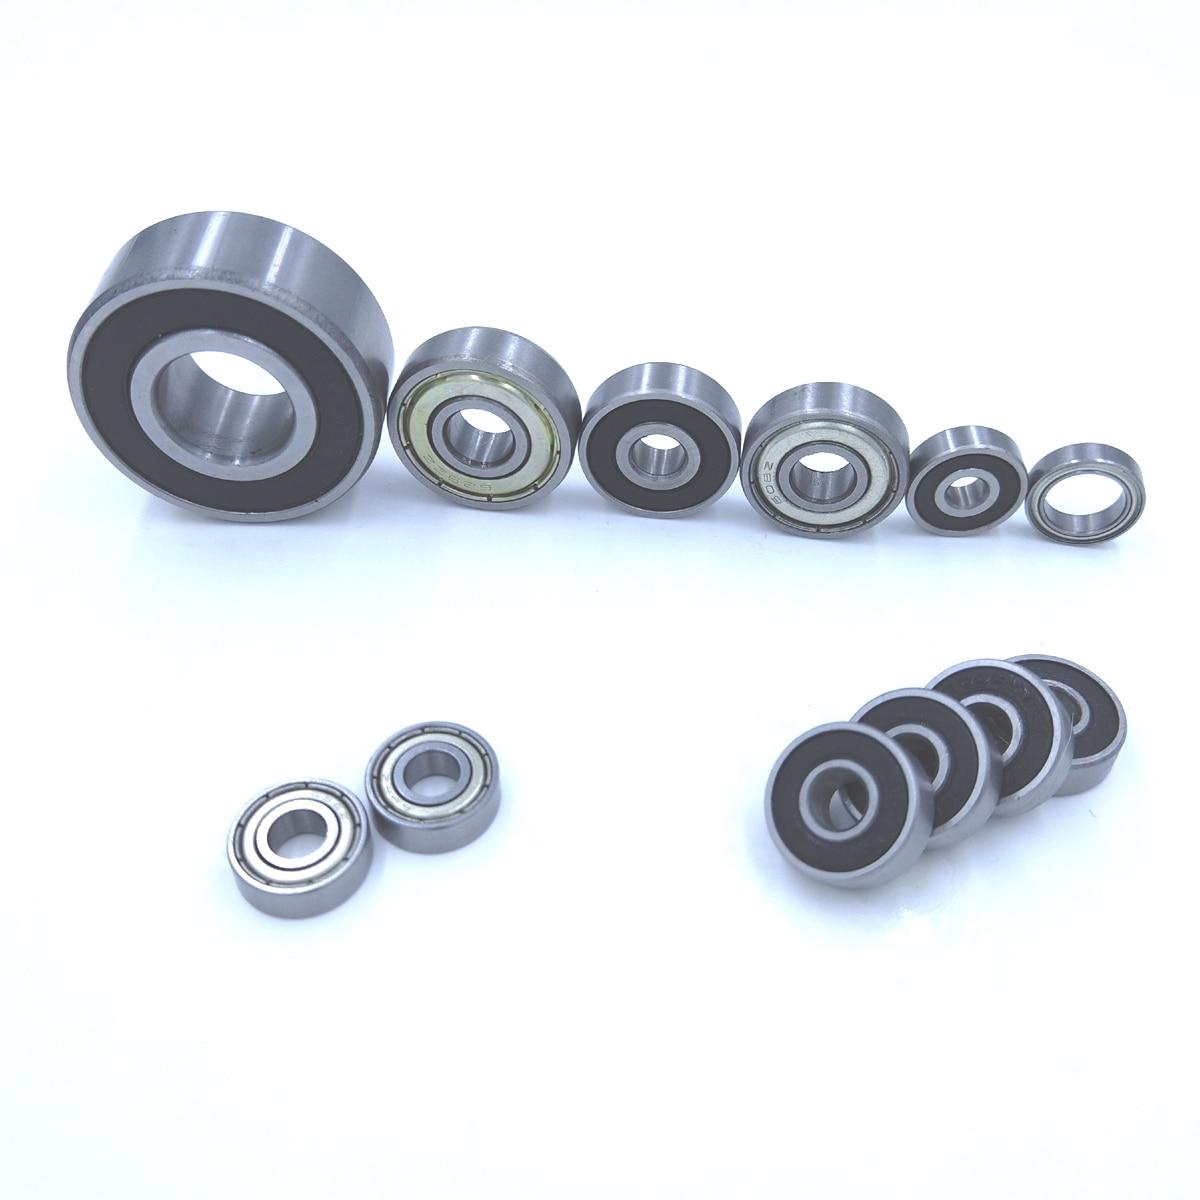 Deep-Groove-Ball-Bearings 608Z 608RS ZZ 2RZ AEBC-5 8x22-X-7mm